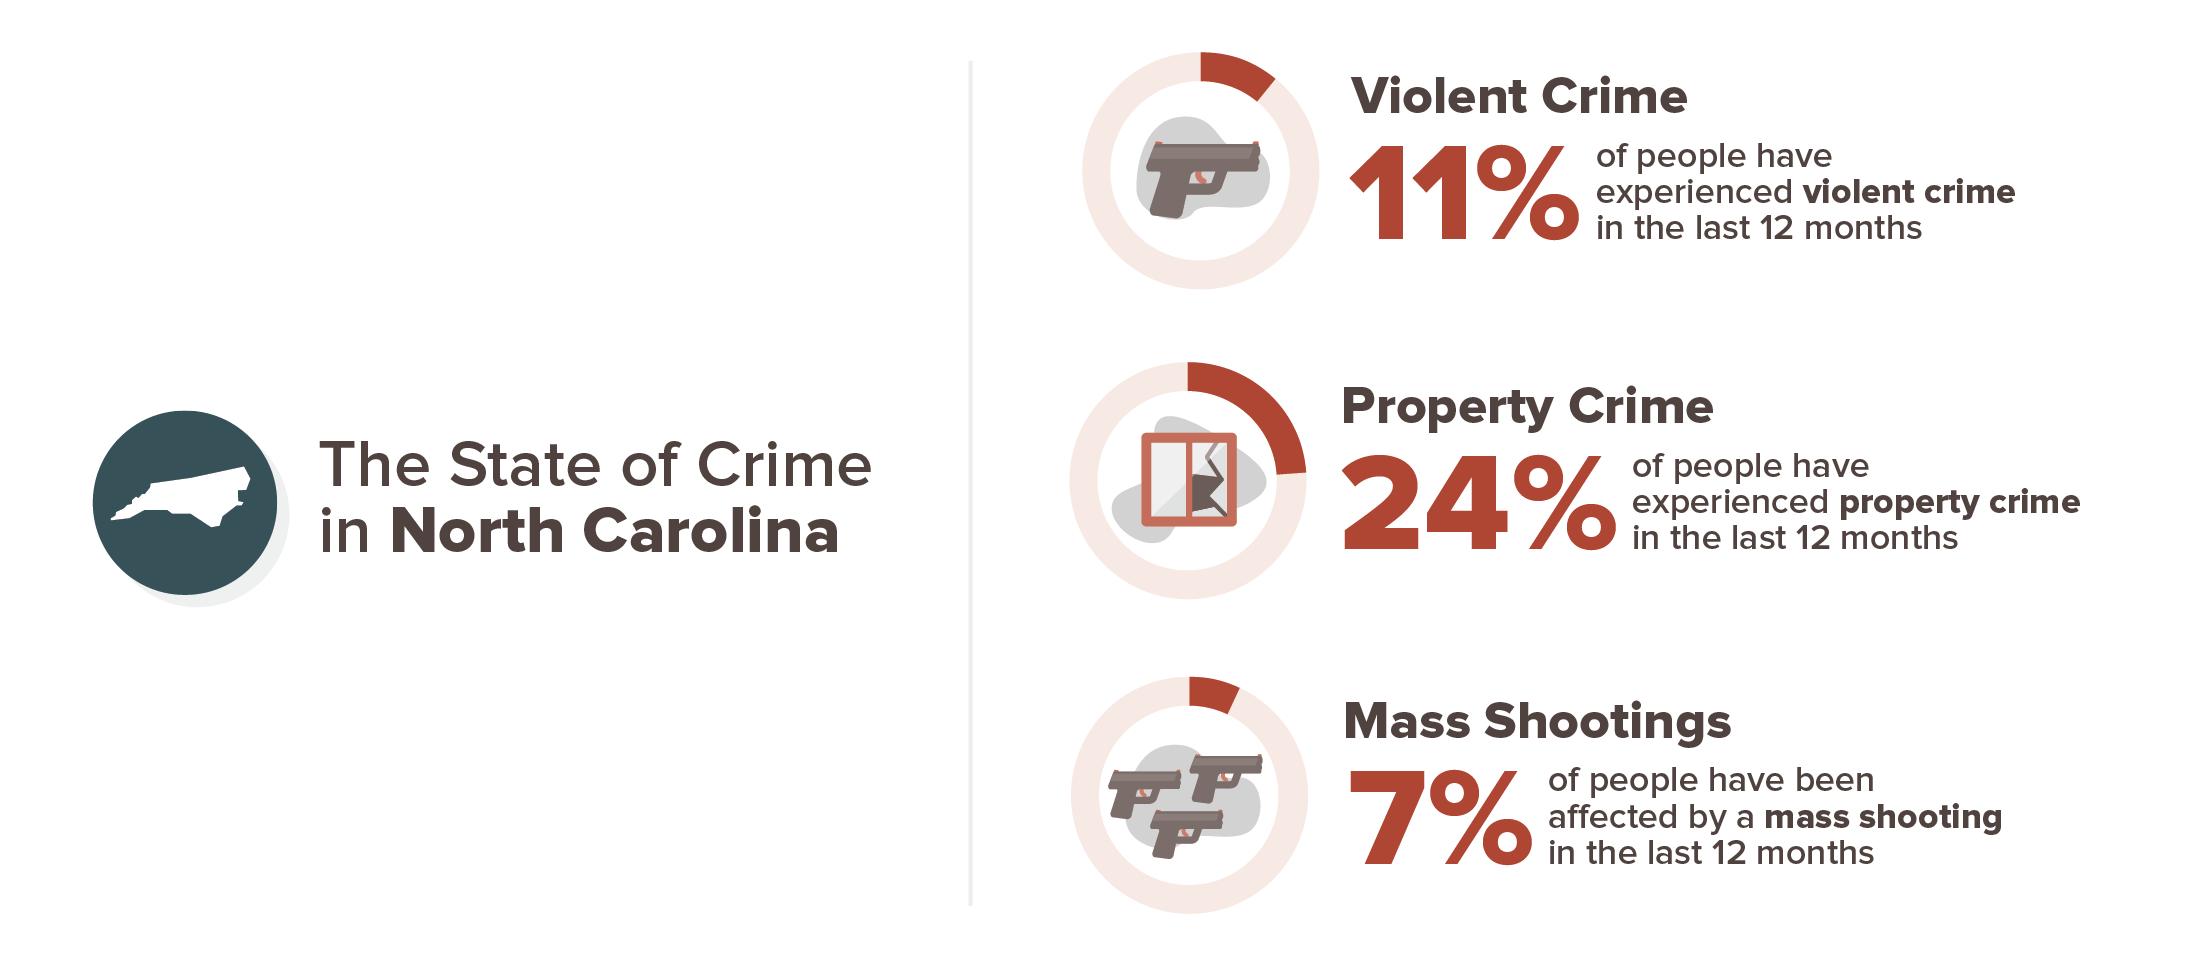 North Carolina crime stats infographic